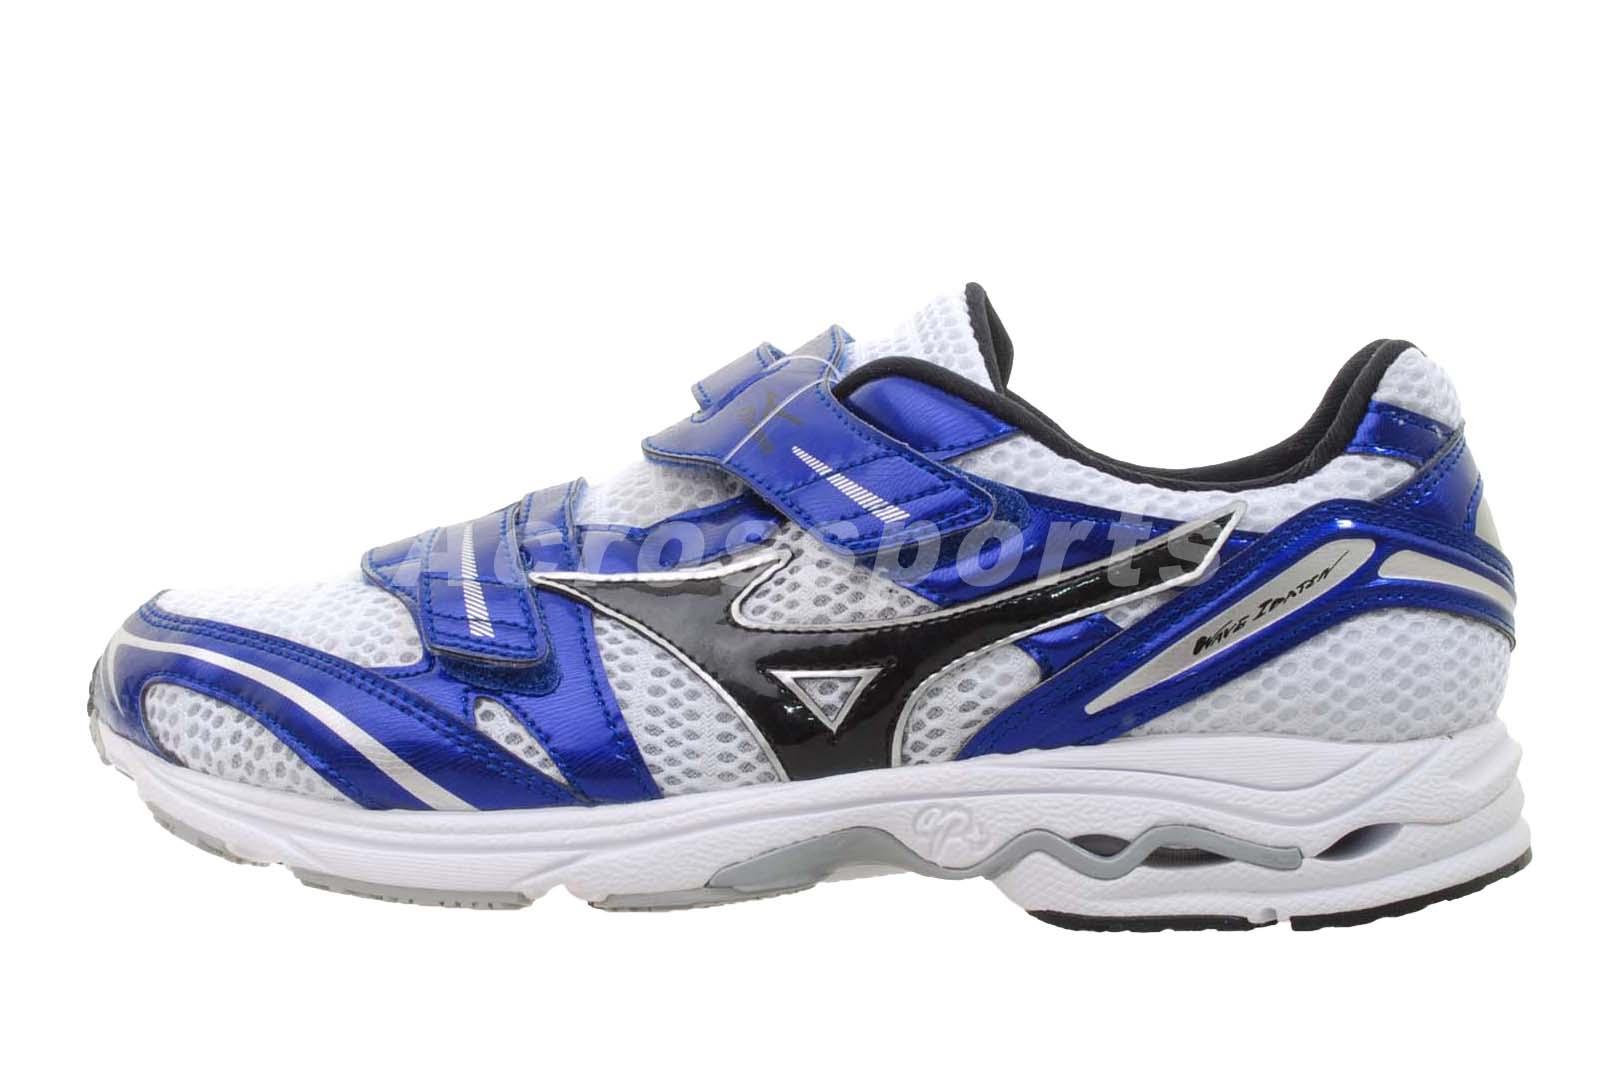 Mens Velcro Running Shoes China